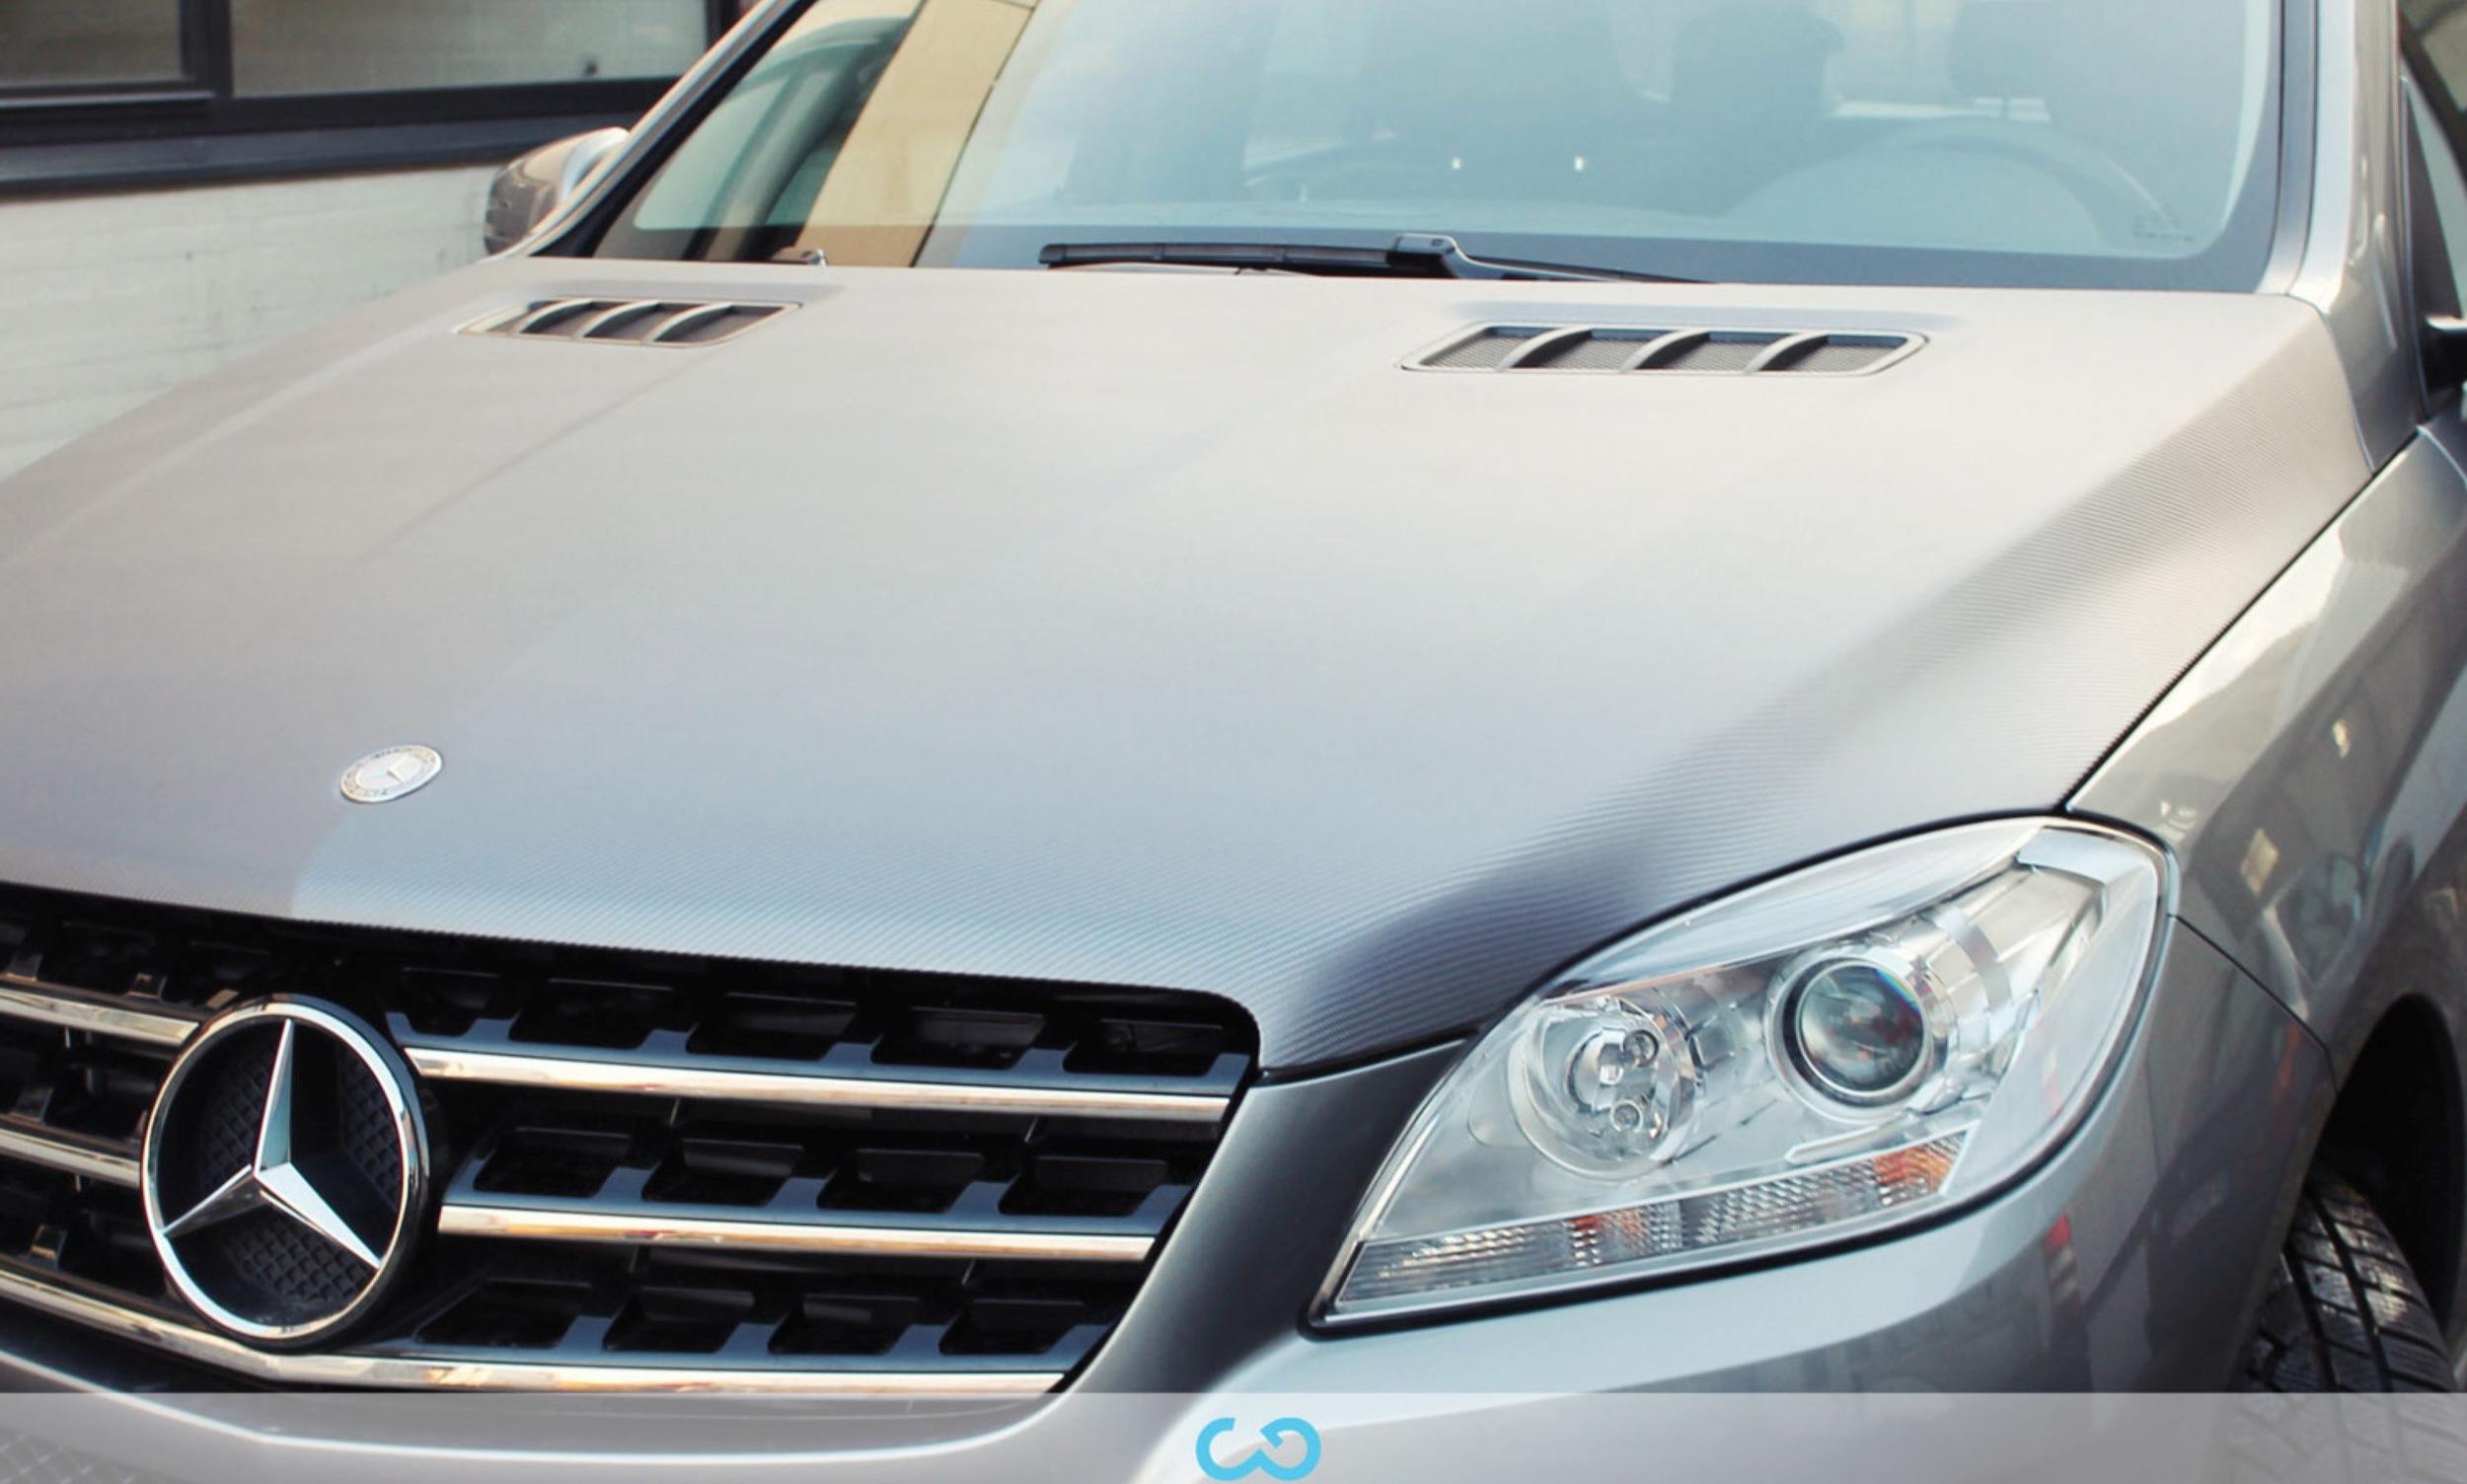 autofolierung-car-wrapping-6-teilfolierung-carbon-motorhaube-dach-mercedes-ml-6-2013-01-122.jpg